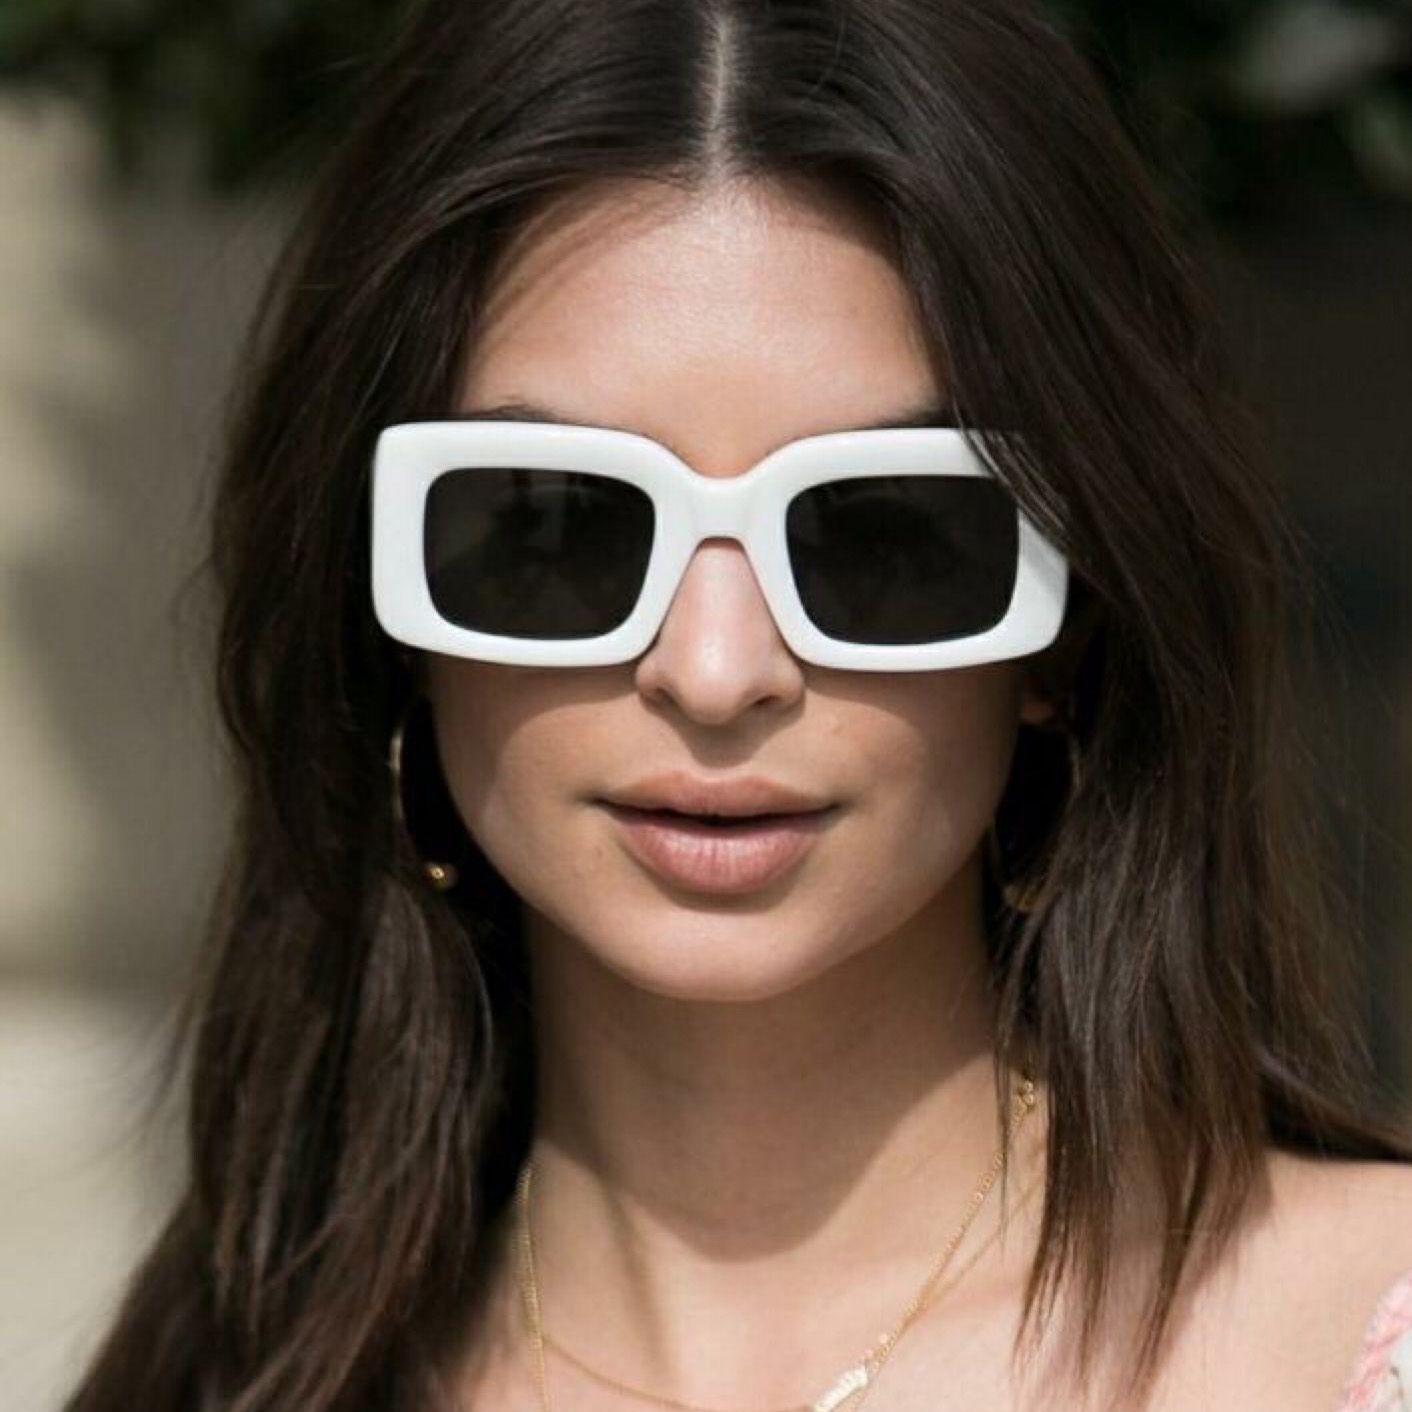 2018 Vintage Oversized Square Sunglasses Women Men Retro Brand